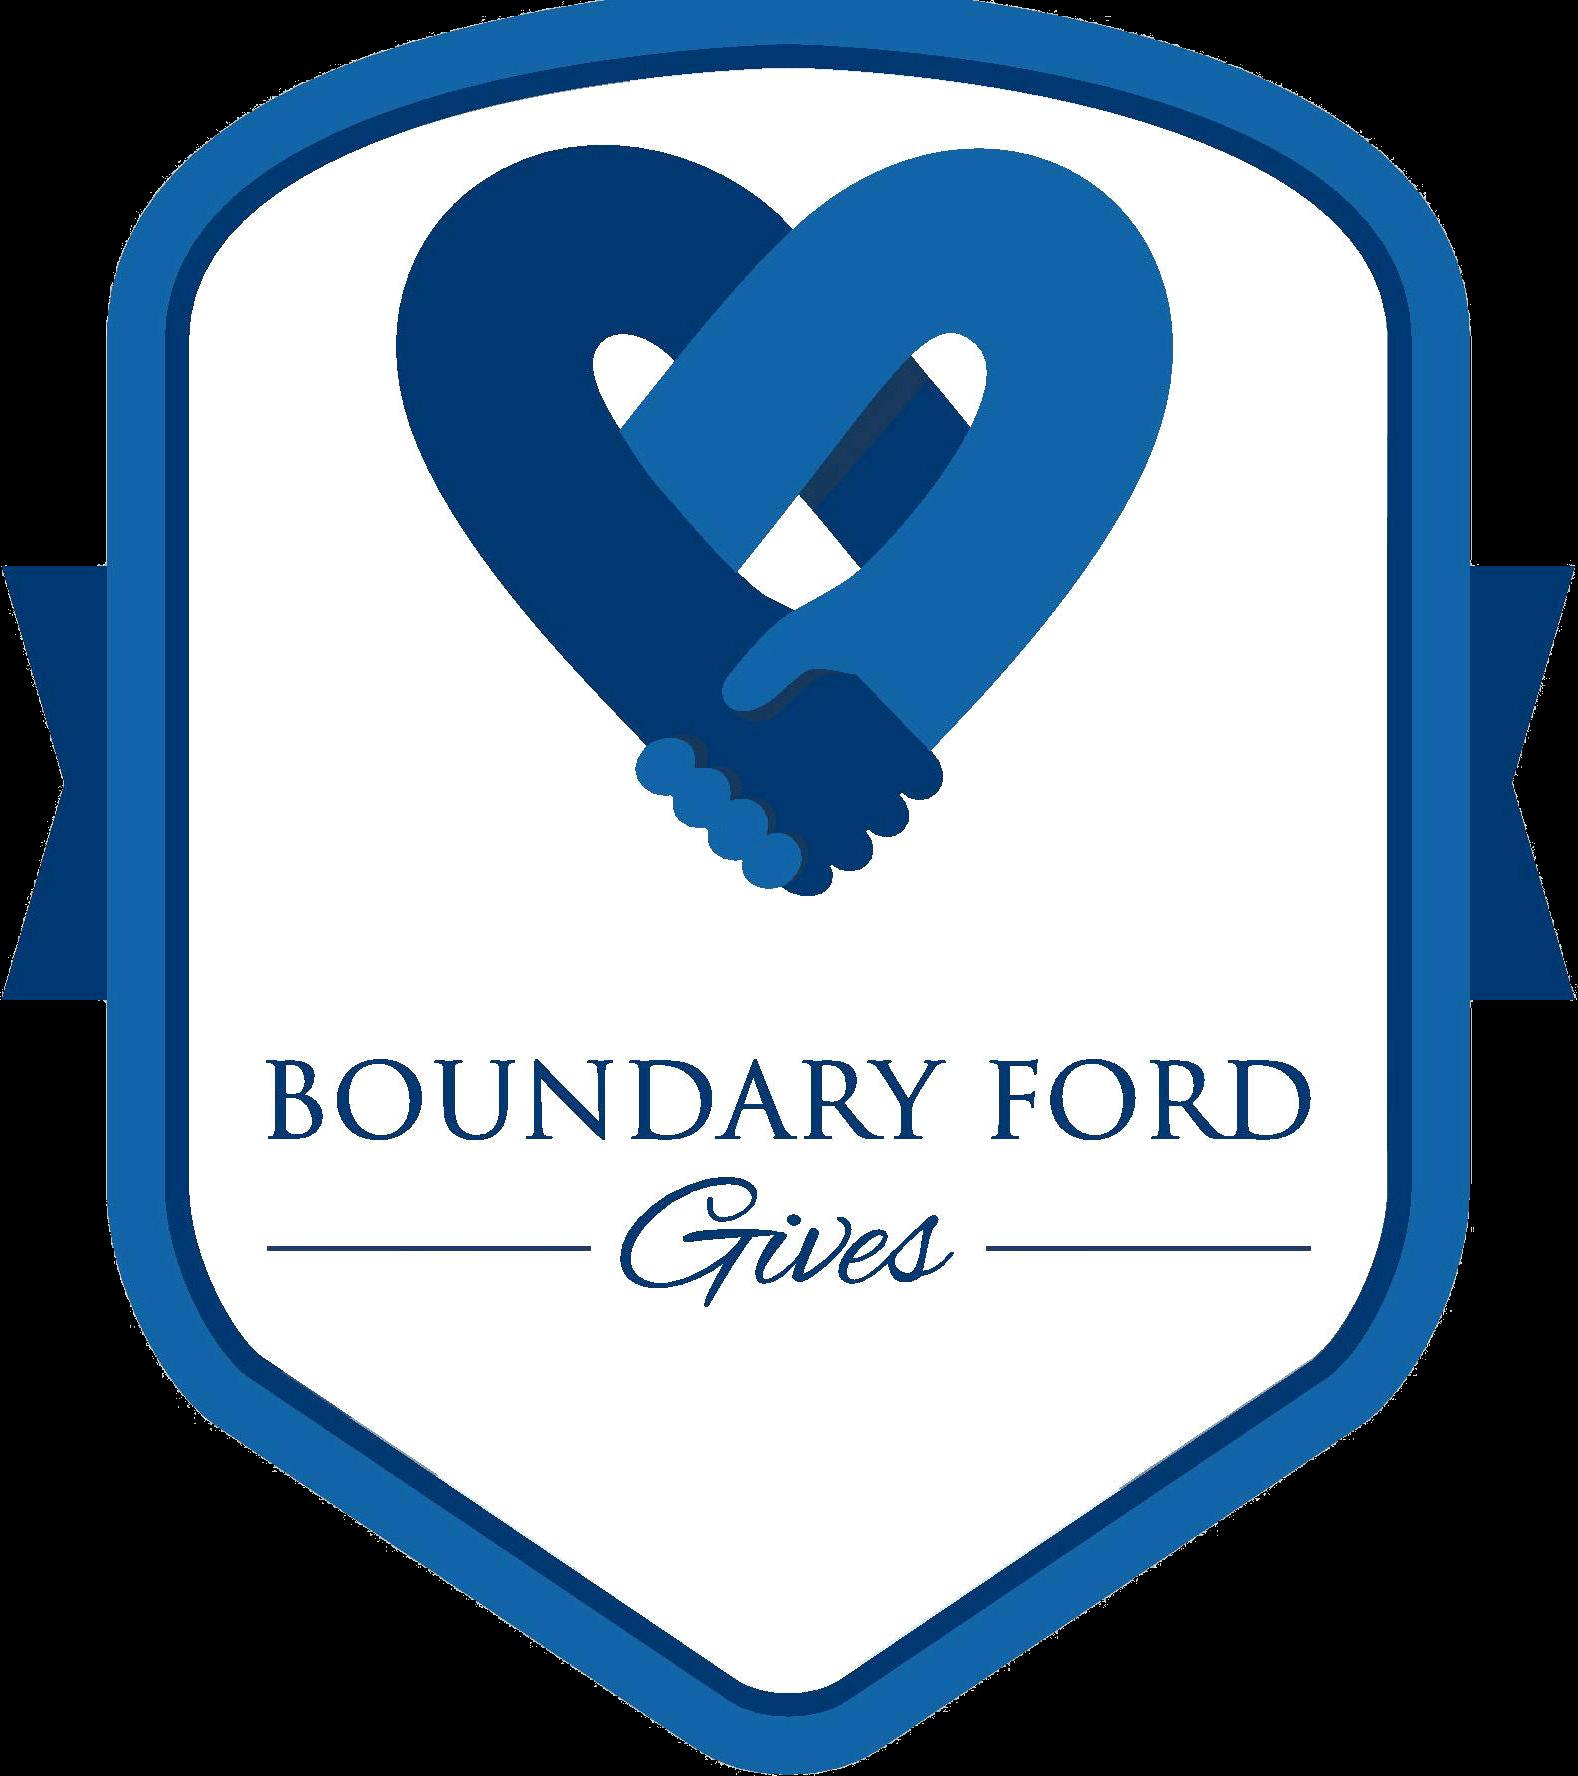 Boundary Ford Sales Used Dealership In Lloydminster White Cargo Van Clip Art Your Community